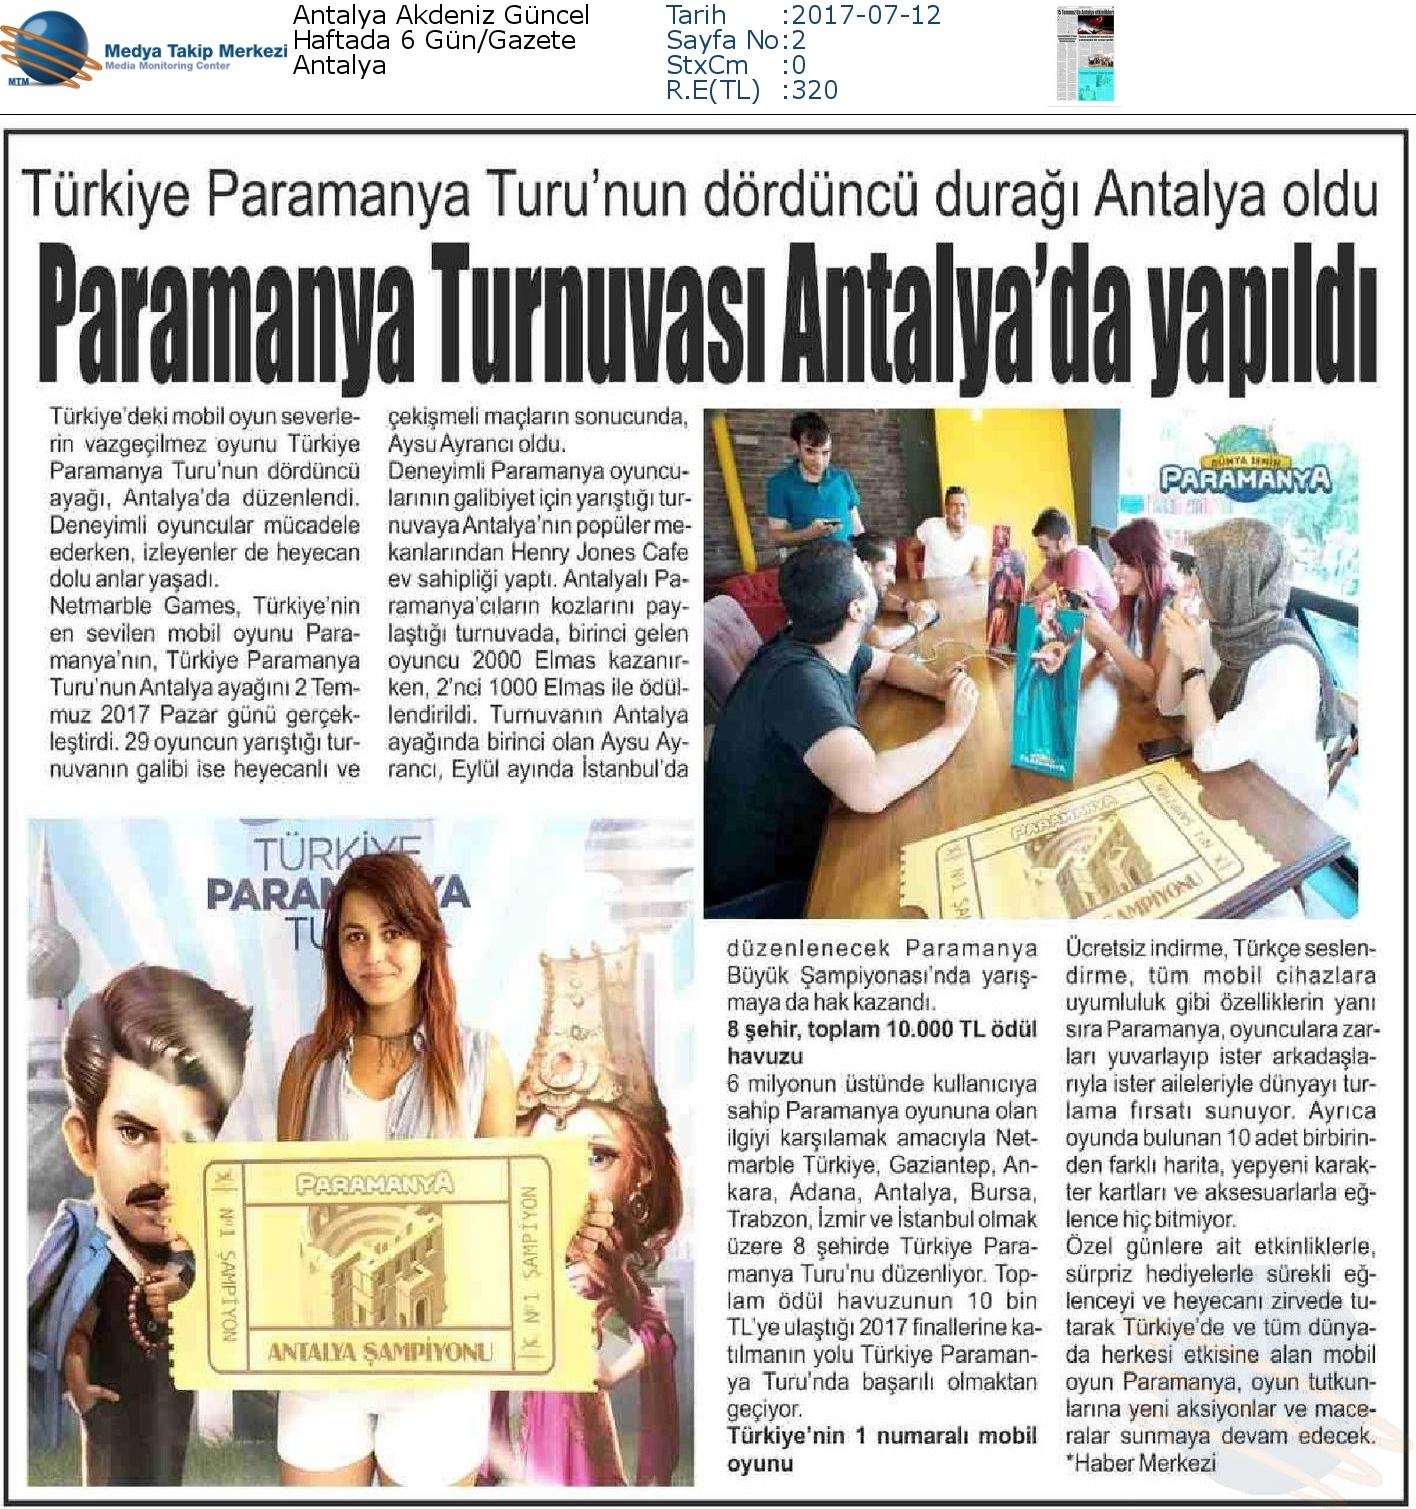 Antalya_Akdeniz_Güncel-PARAMANYA_TURNUVASI_ANTALYADA_YAPILDI-12.07.2017